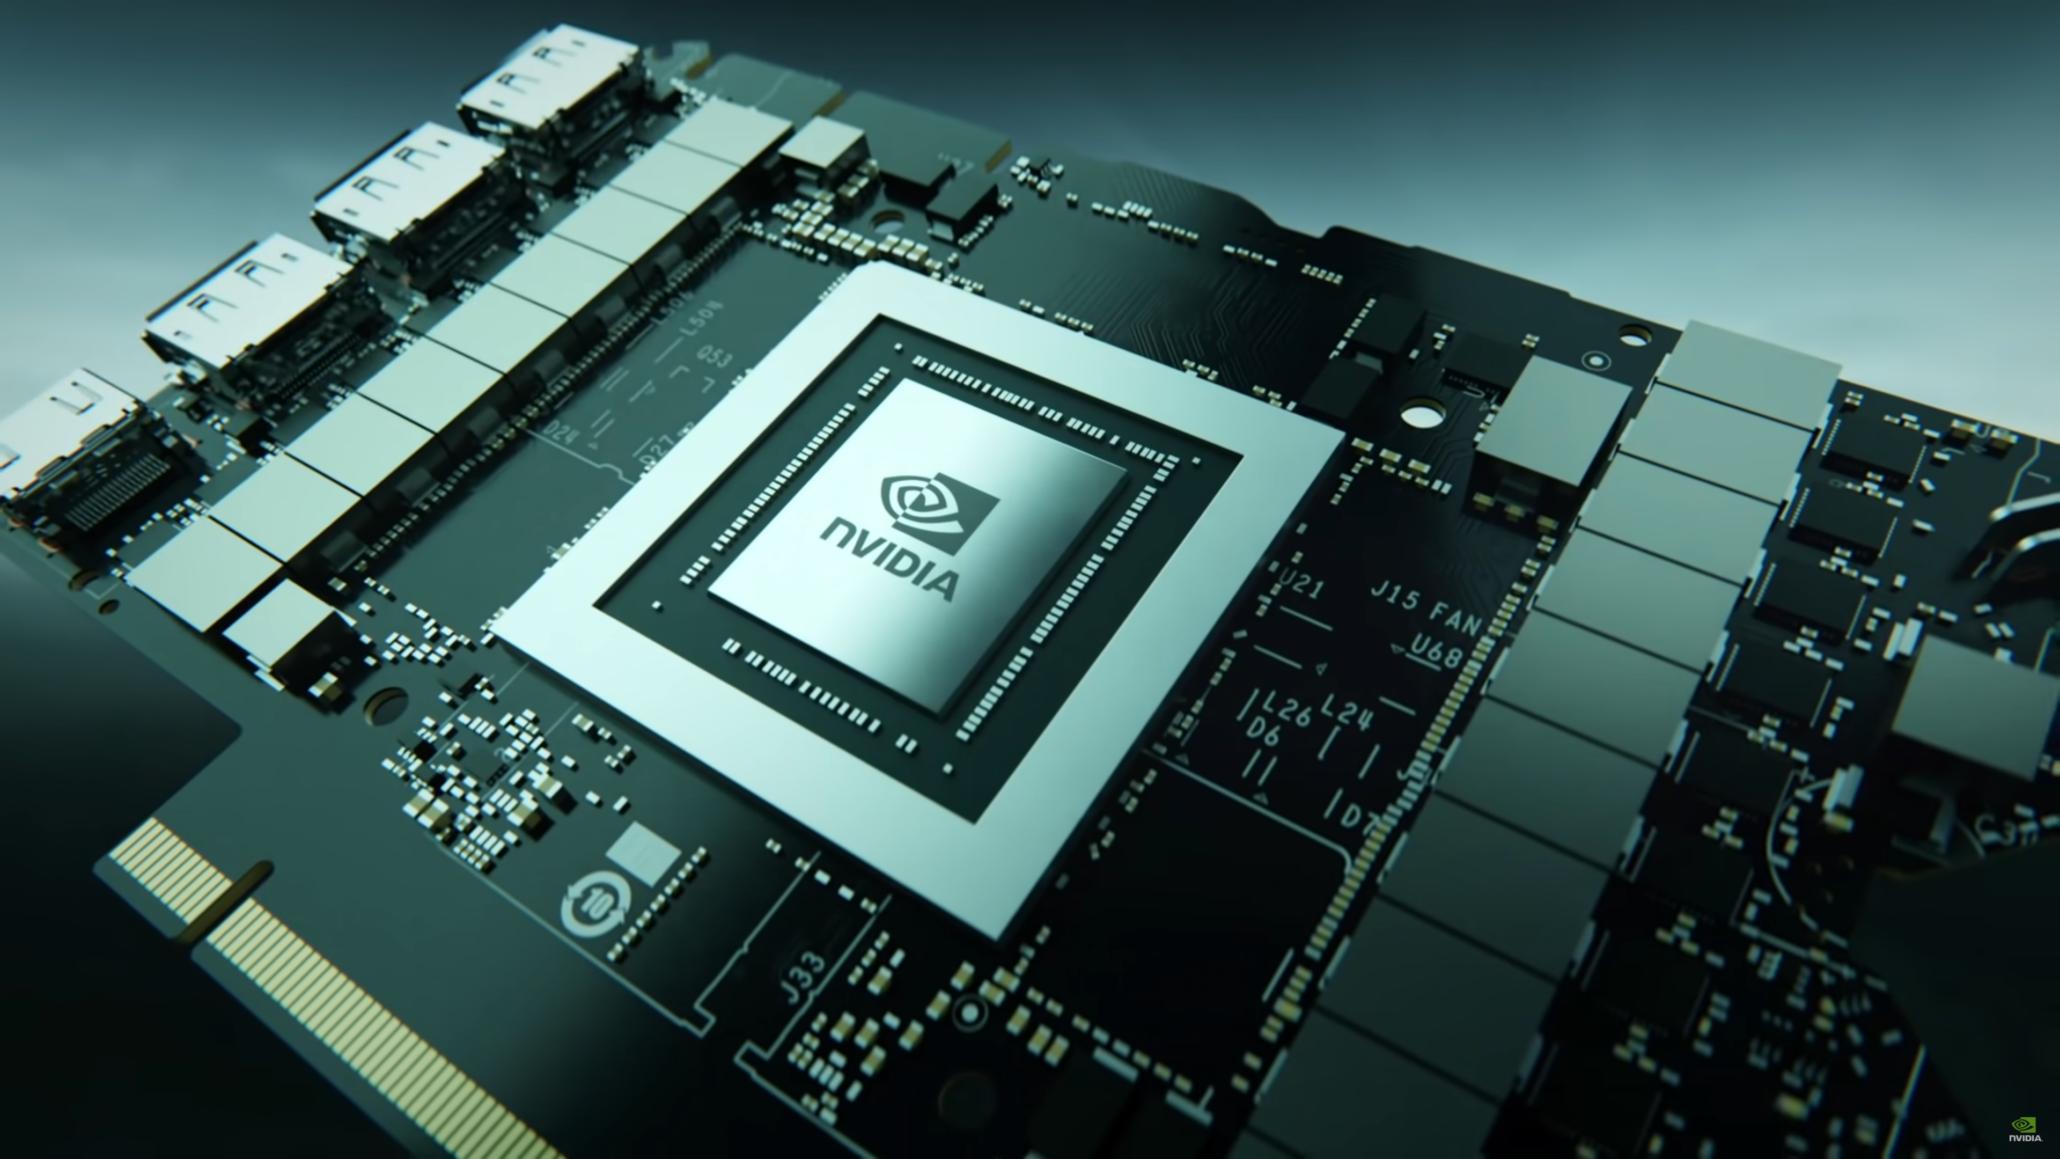 NVIDIA GeForce RTX 3080 Ti Graphics Card Dengan 10.496 CUDA Core, 20 GB GDDR6X Memory & 320W TGP, Menghadapi AMD RX 6800 XT